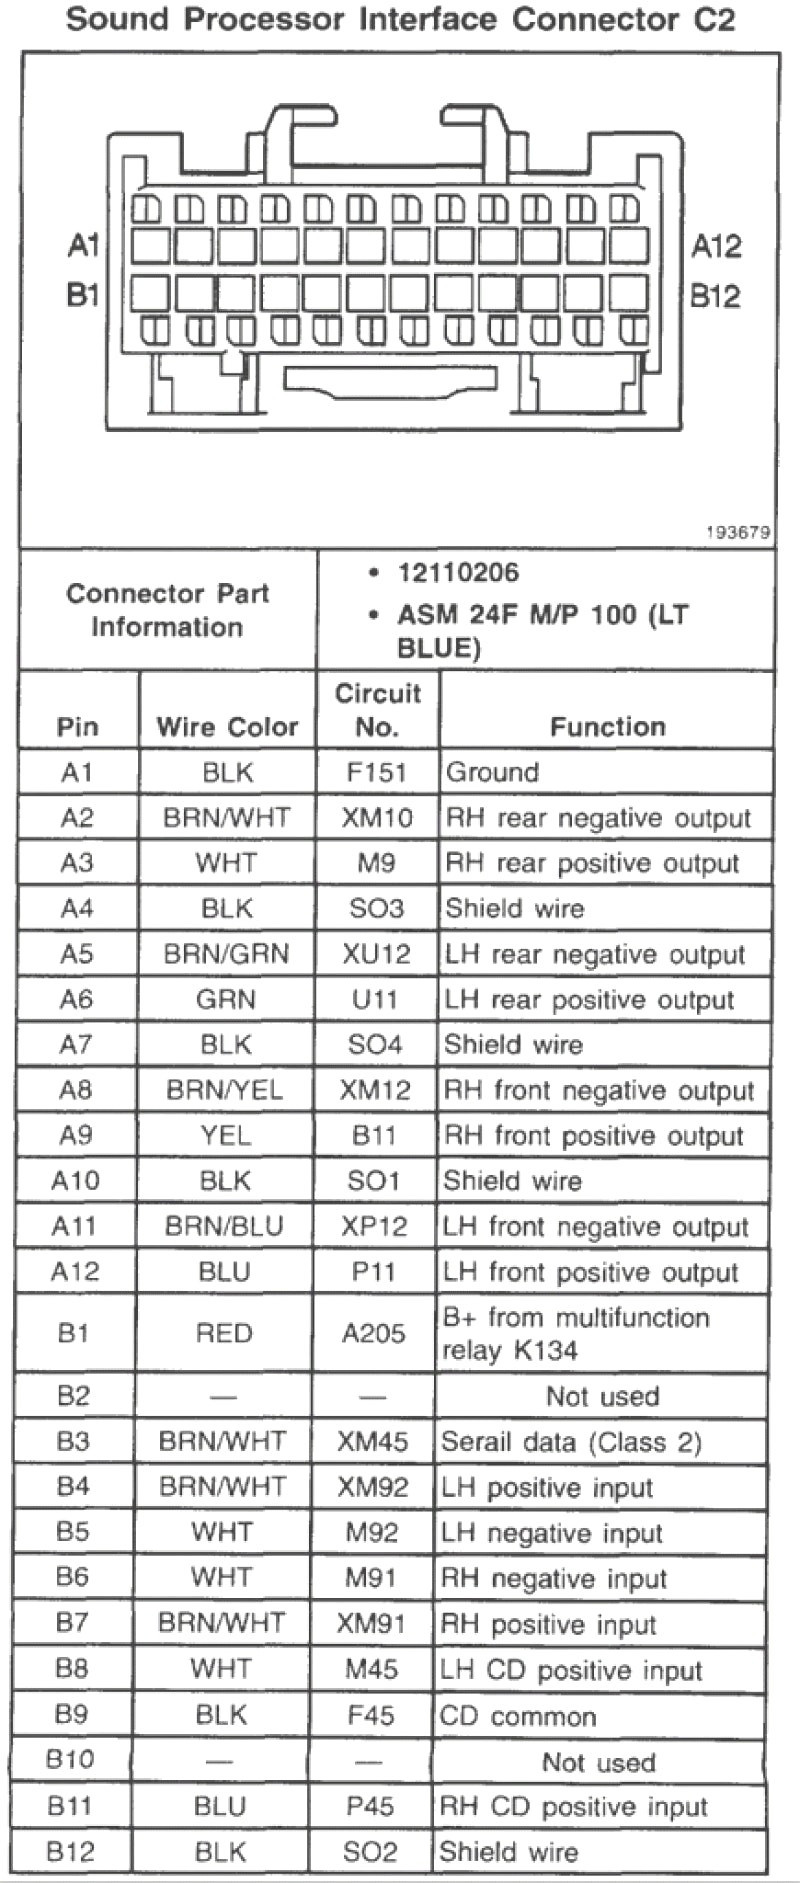 BZ_1804] Wiring Deh Diagram Pioneer X6600Bs Schematic Wiring  Lotap Vira Crove Venet Rious Umng Rect Mohammedshrine Librar Wiring 101